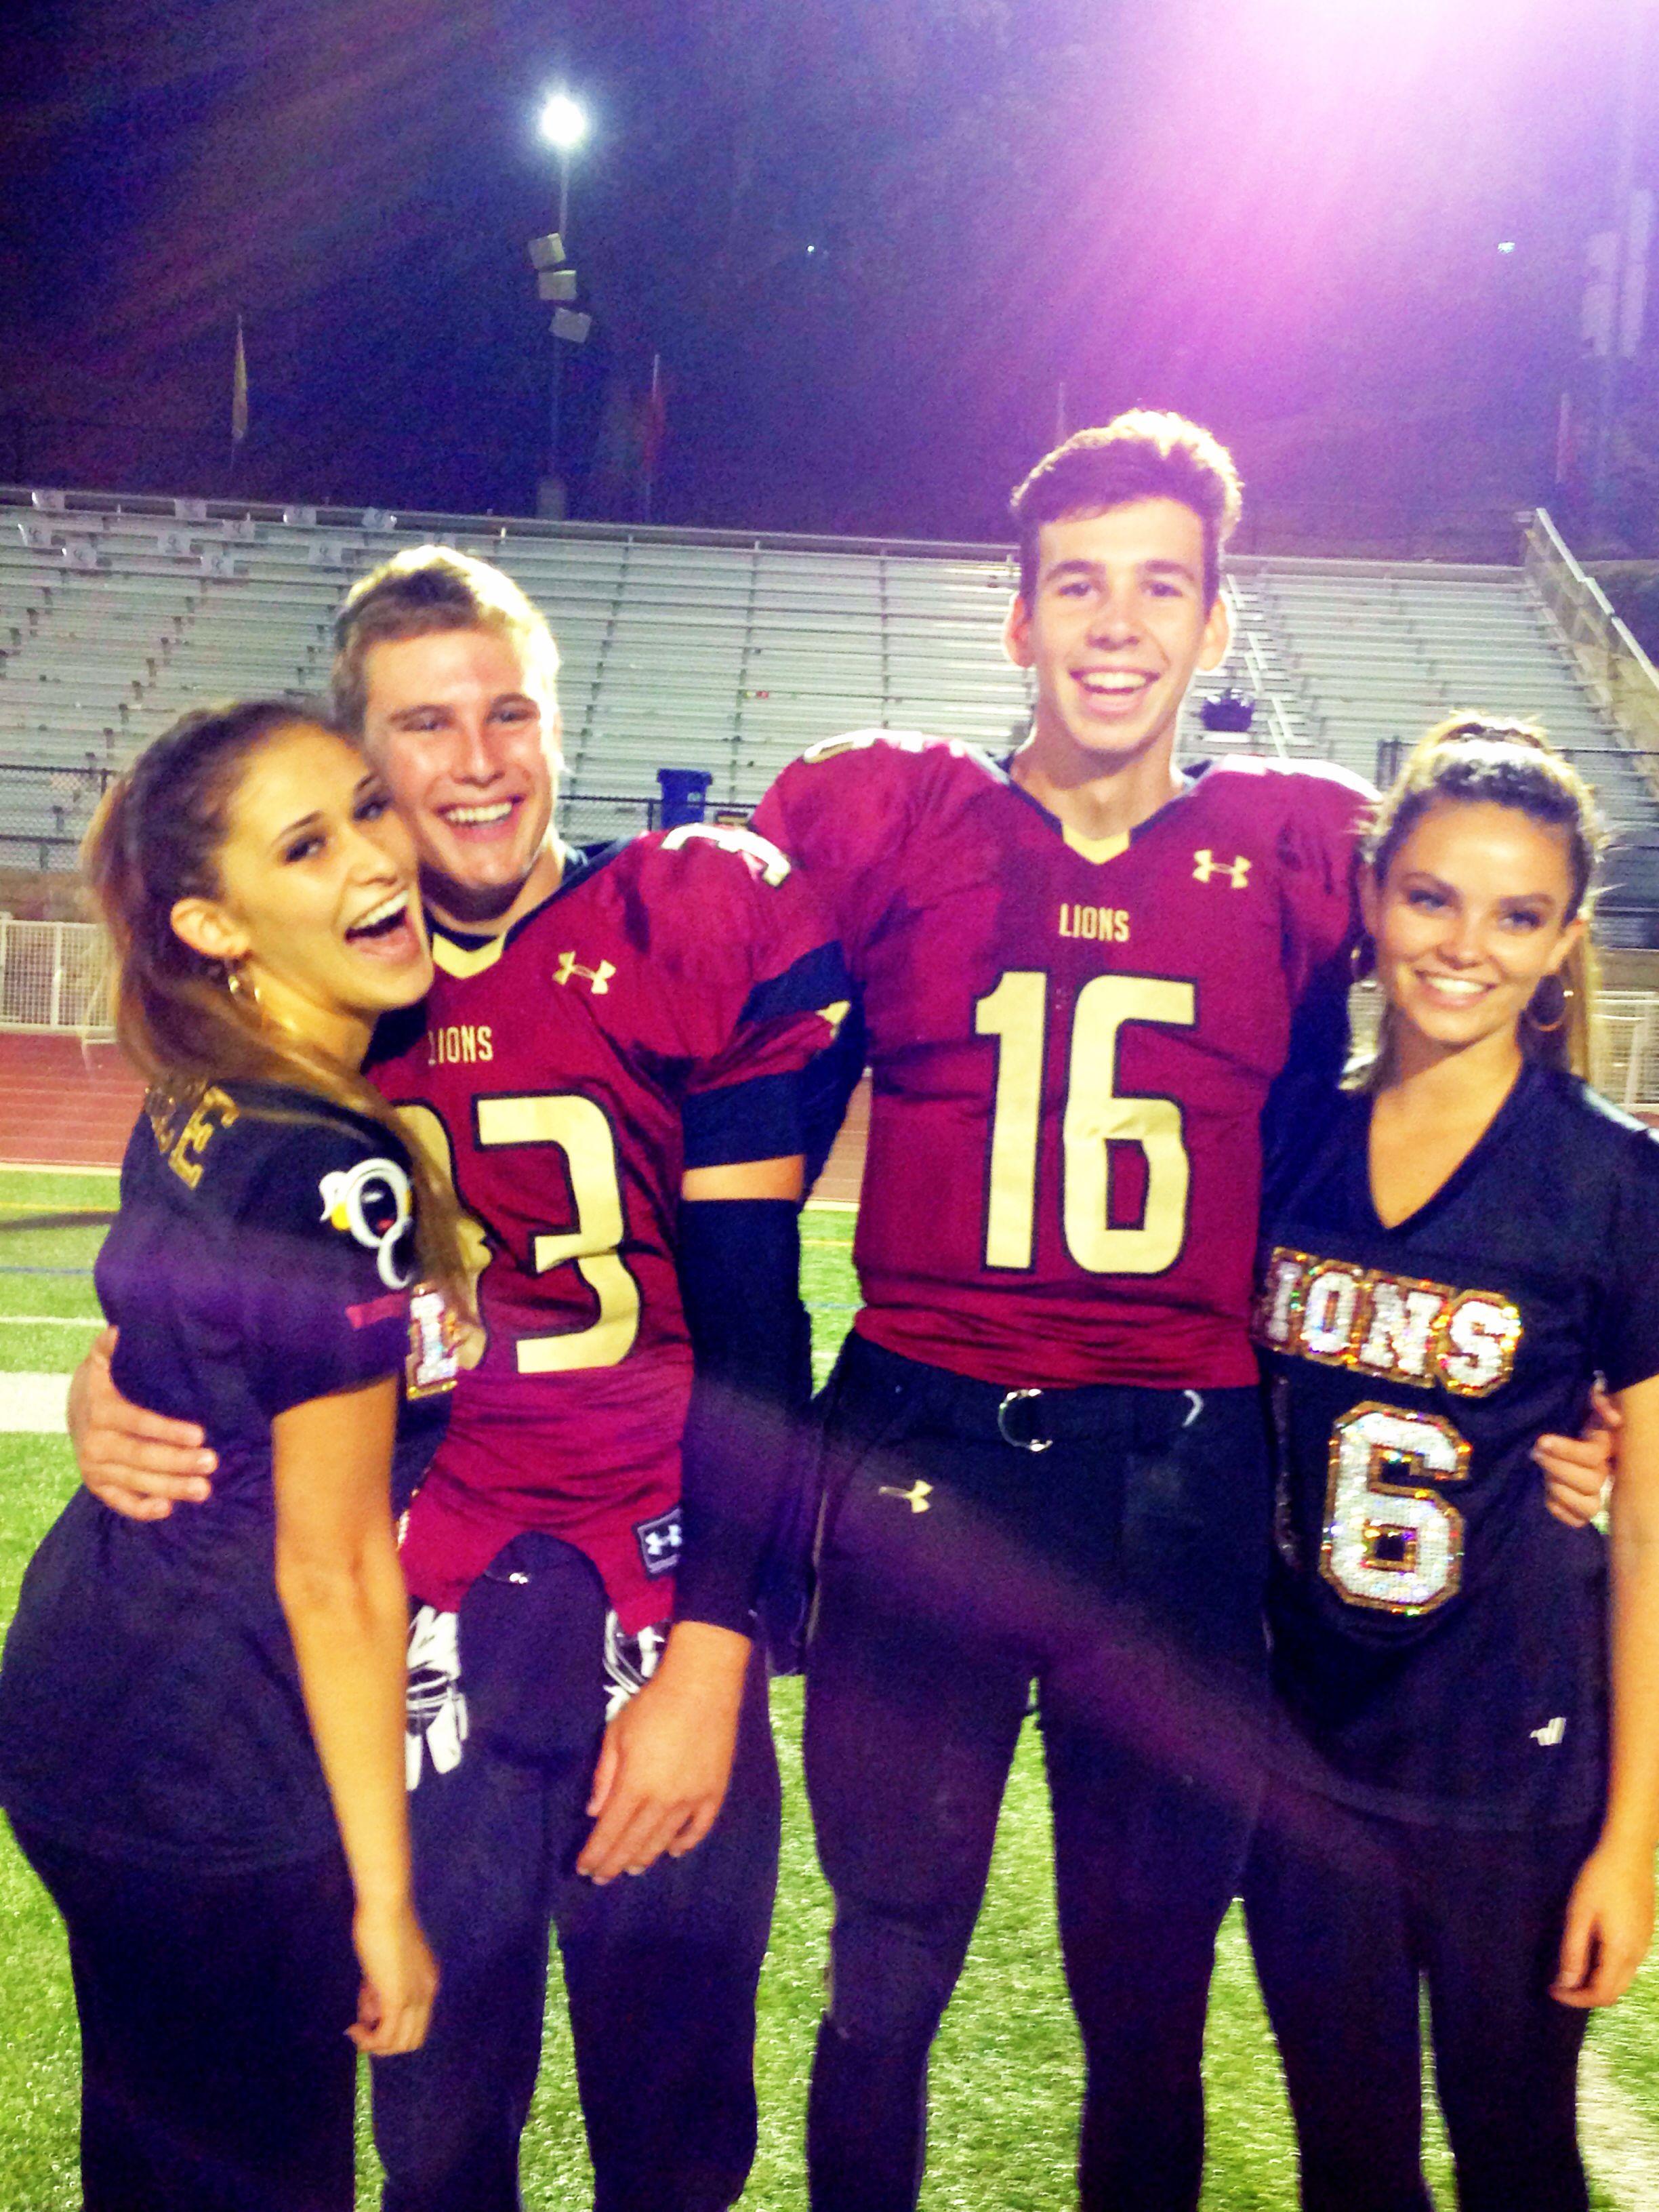 Hunter Douglas & friends. #Football&Fall